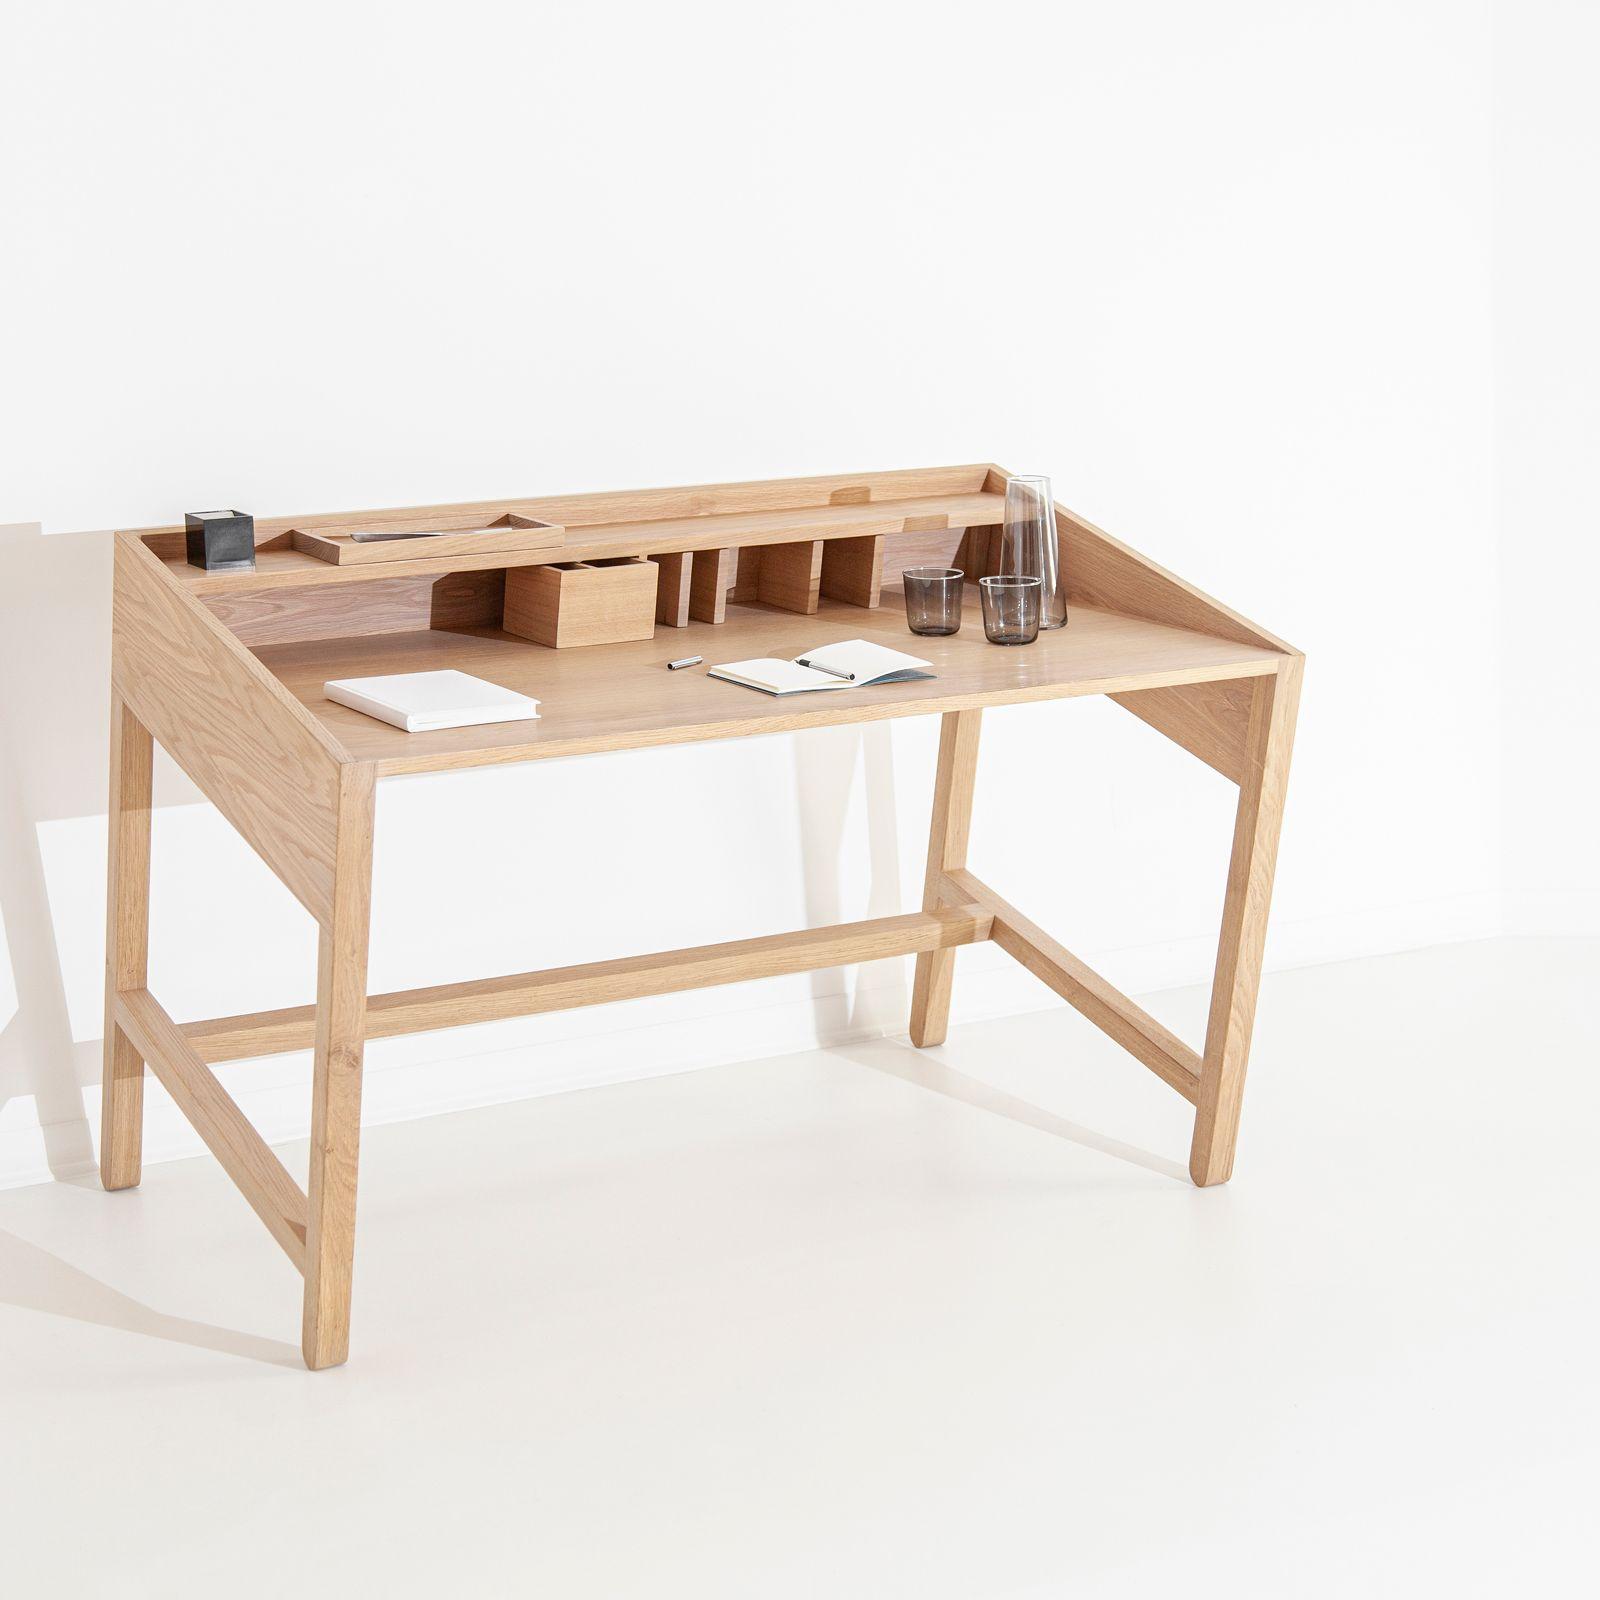 Torta Wooden Desk - OWN